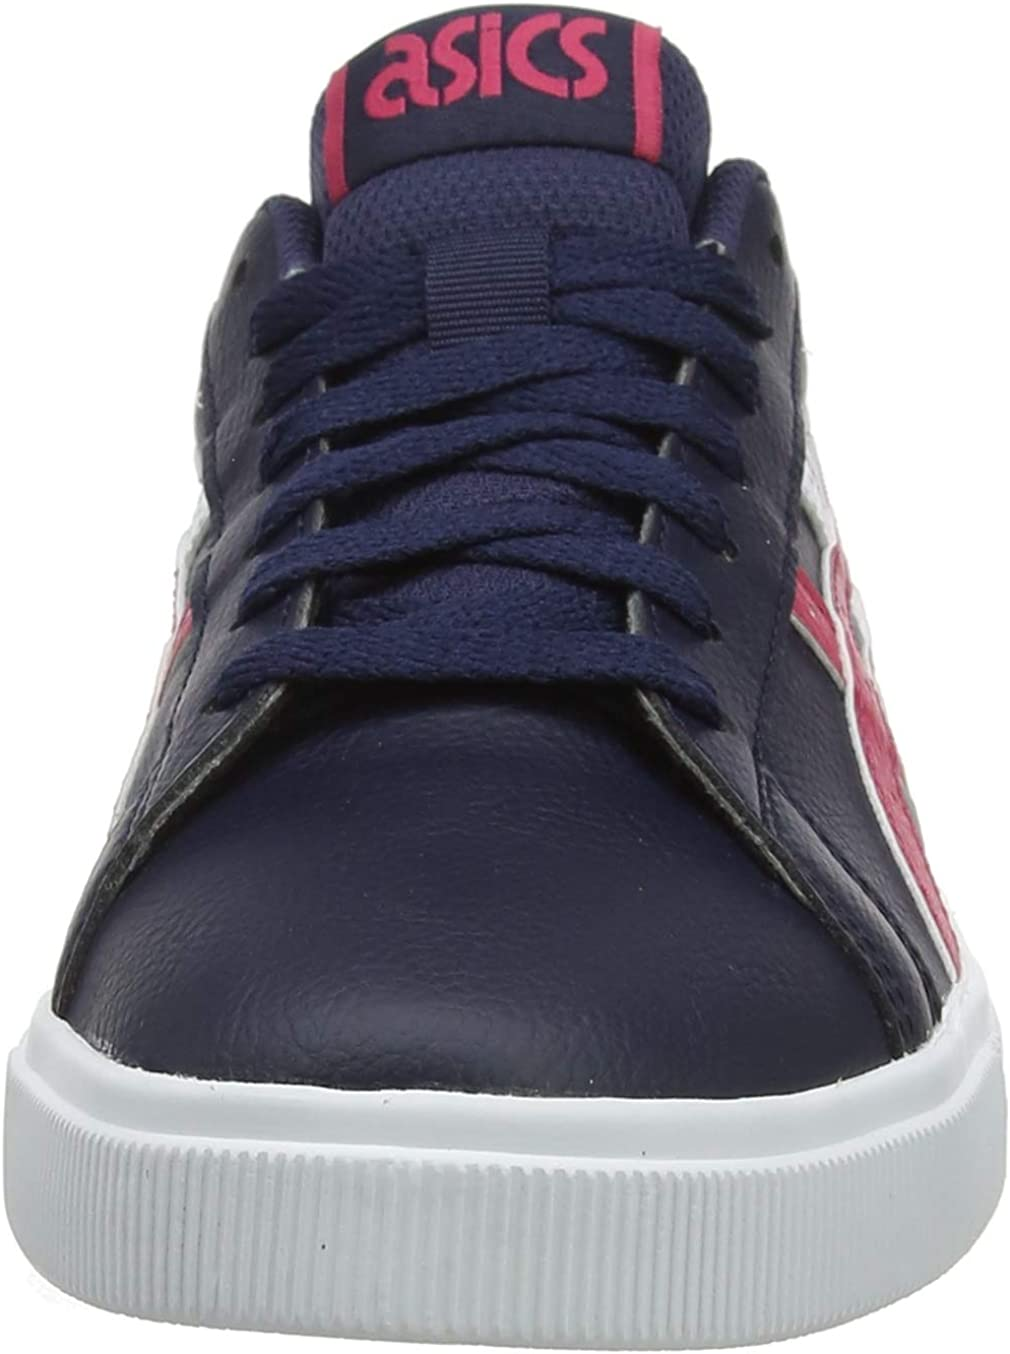 ASICS Classic CT Zapatos de Baloncesto para Mujer